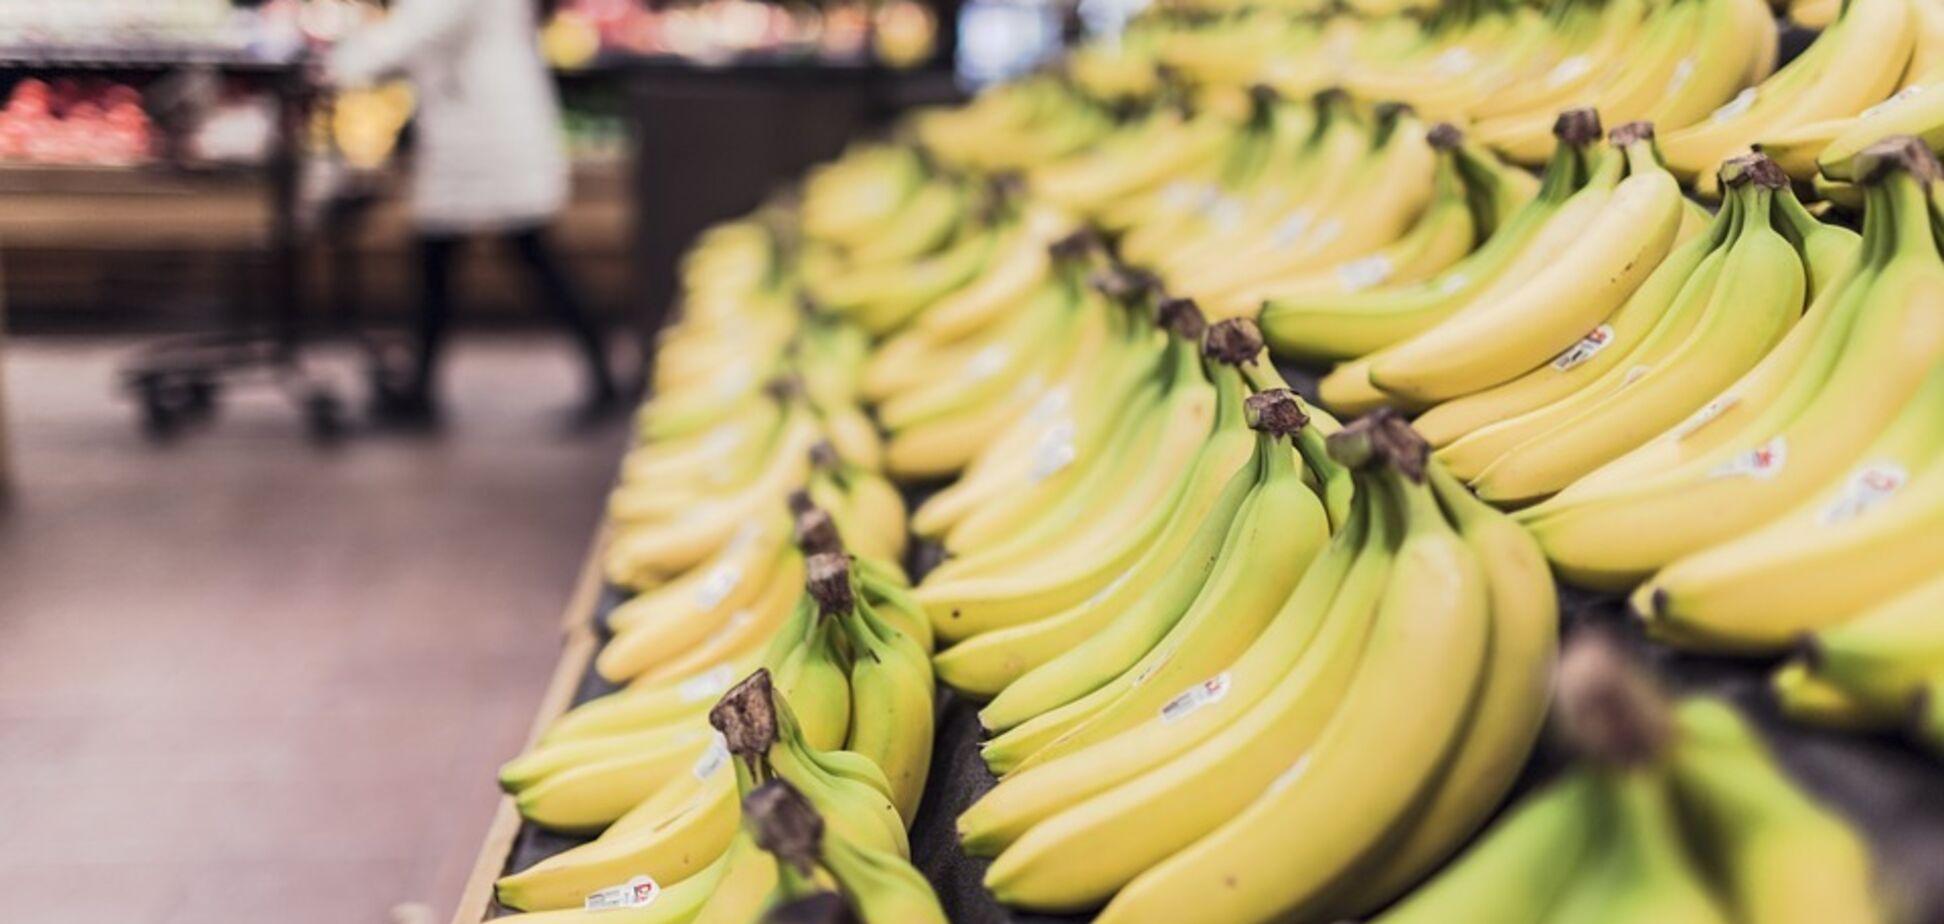 Как дурят в супермаркетах